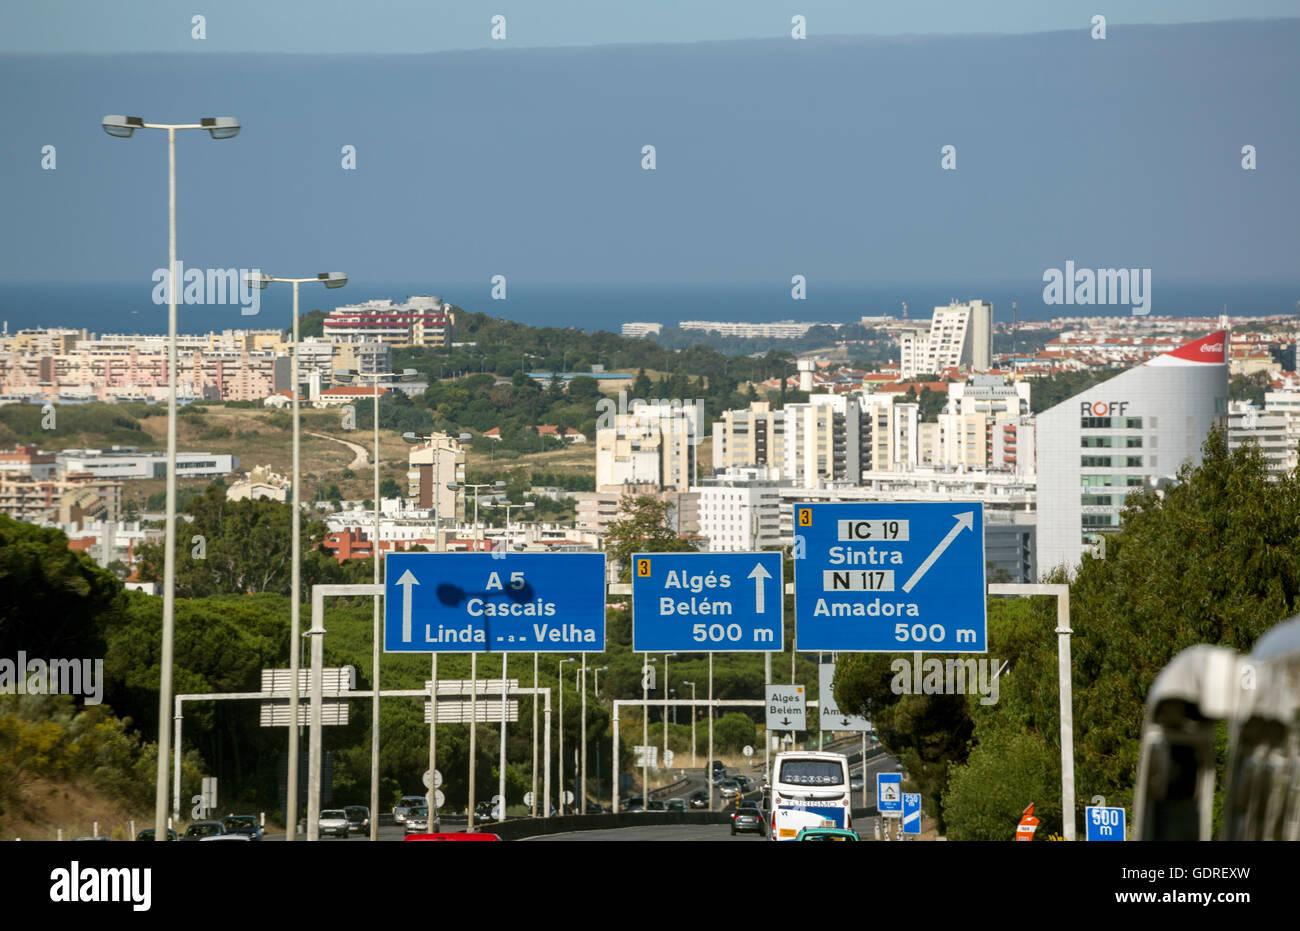 Road sign with regard to Belem and Sintra, Lisbon, District of Lisbon, Portugal, Europe Sintra, Lisbon, Lisbon, - Stock Image